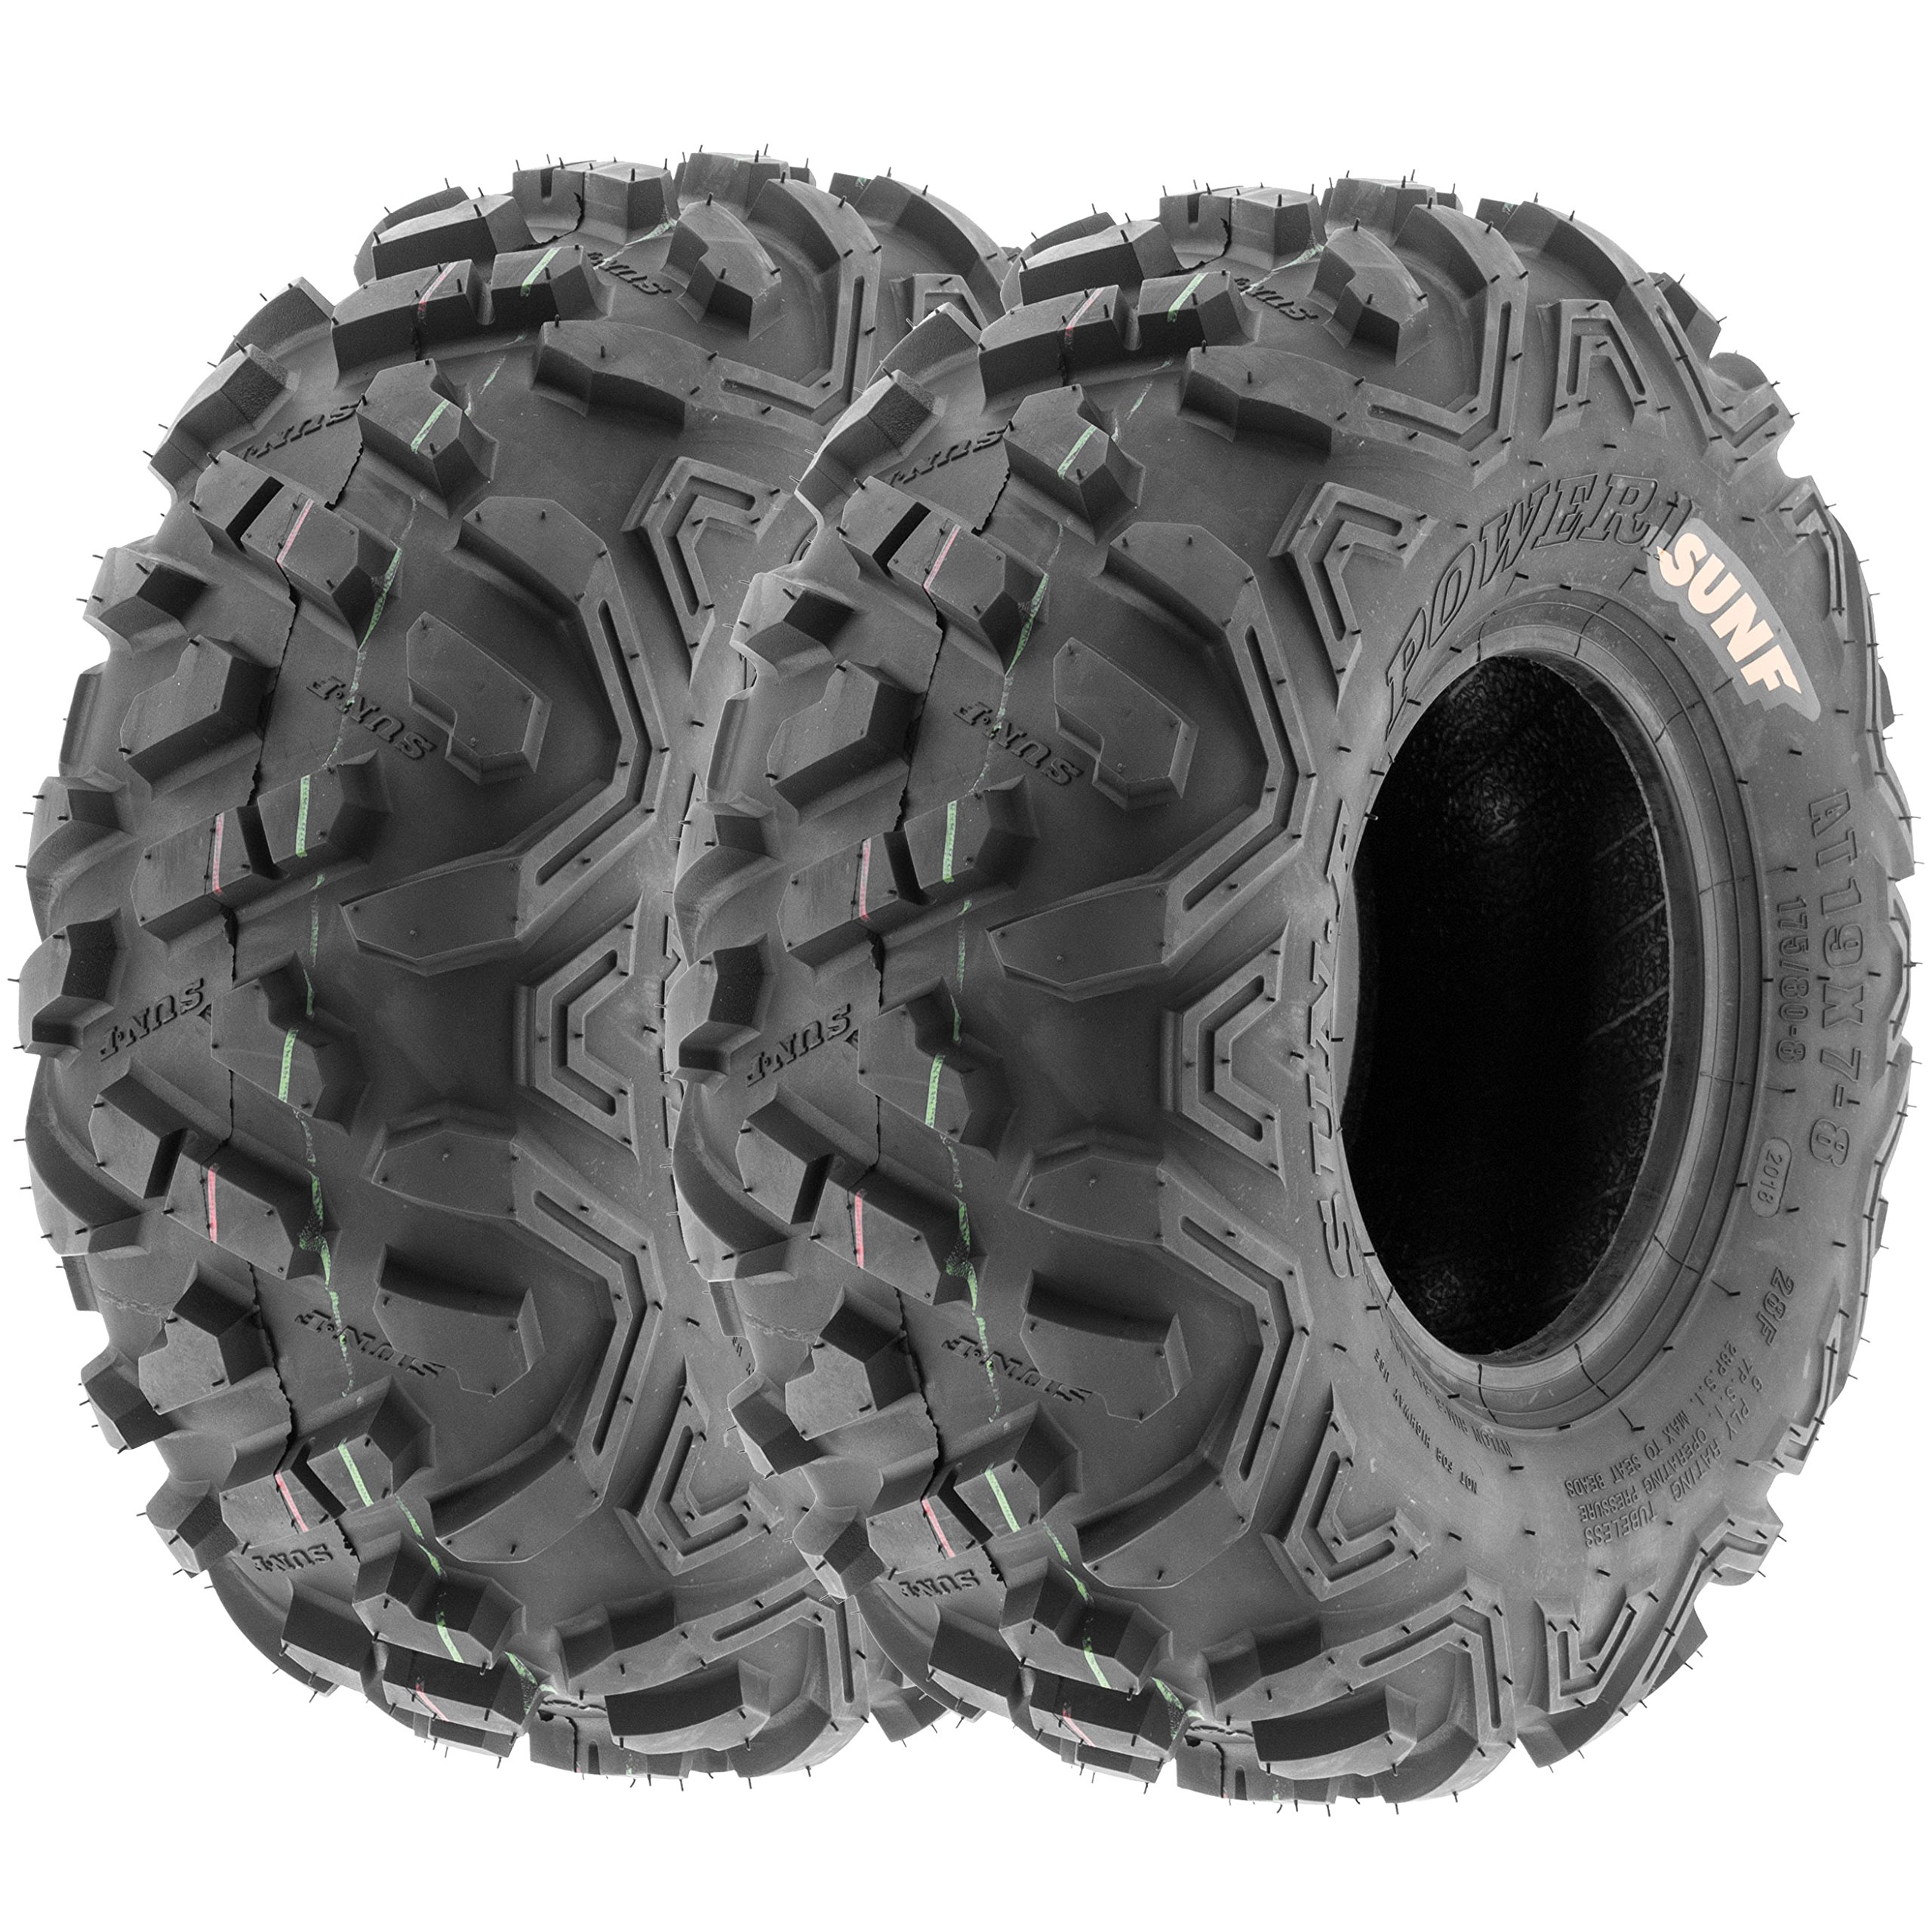 Pair of 2 SunF Power.II AT 16x8-7 ATV & Go-Kart Off-Road Tires, All-Terrain, 6 PR, Tubeless A051